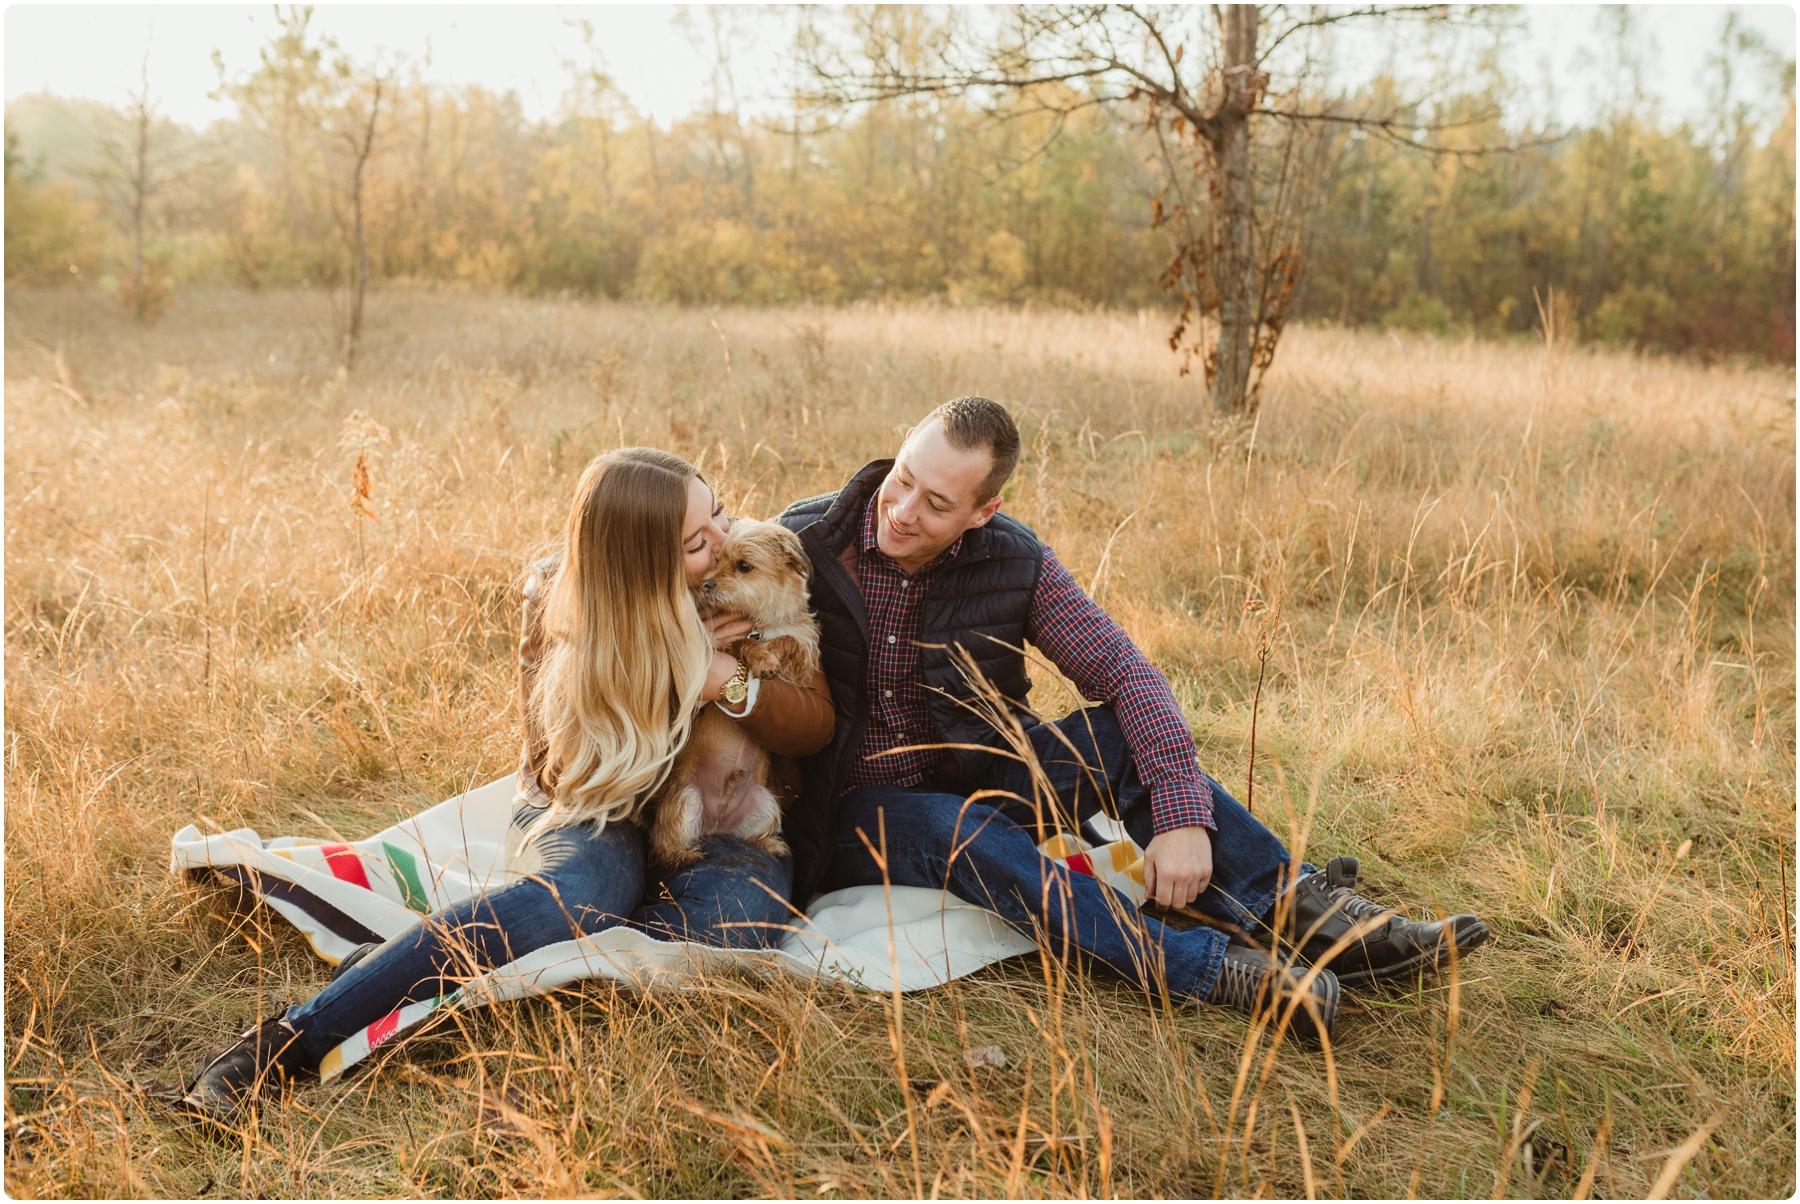 Katerine & Chris Greenwood engagement_0020